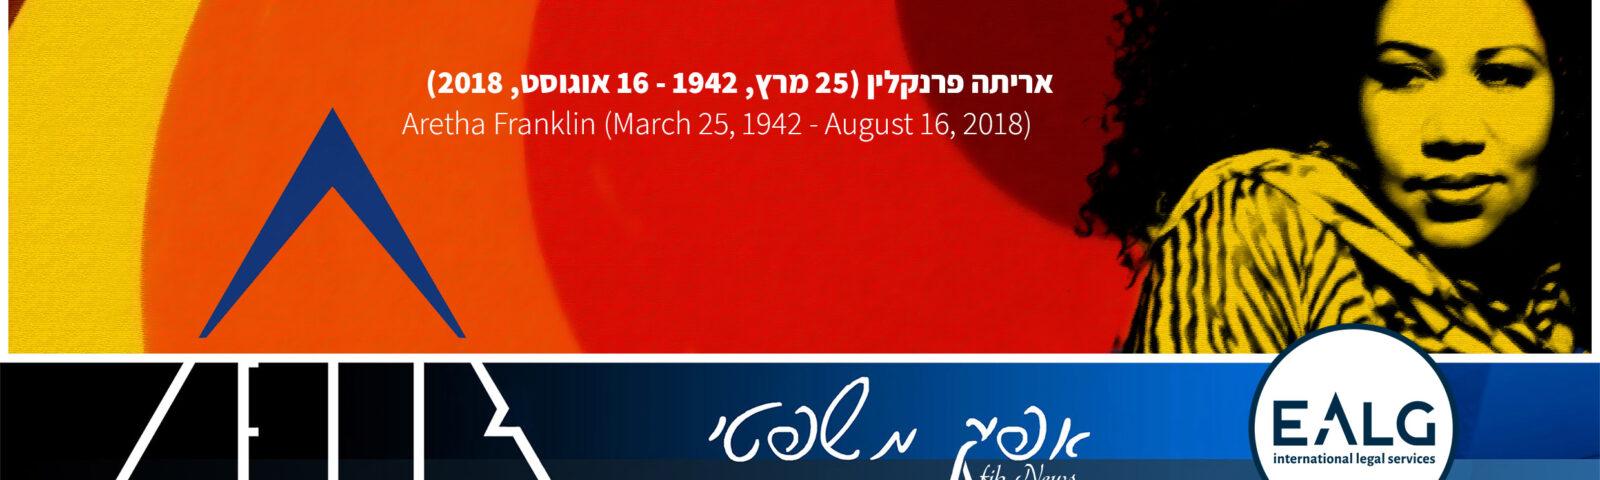 Afik News 305 25.03.2020